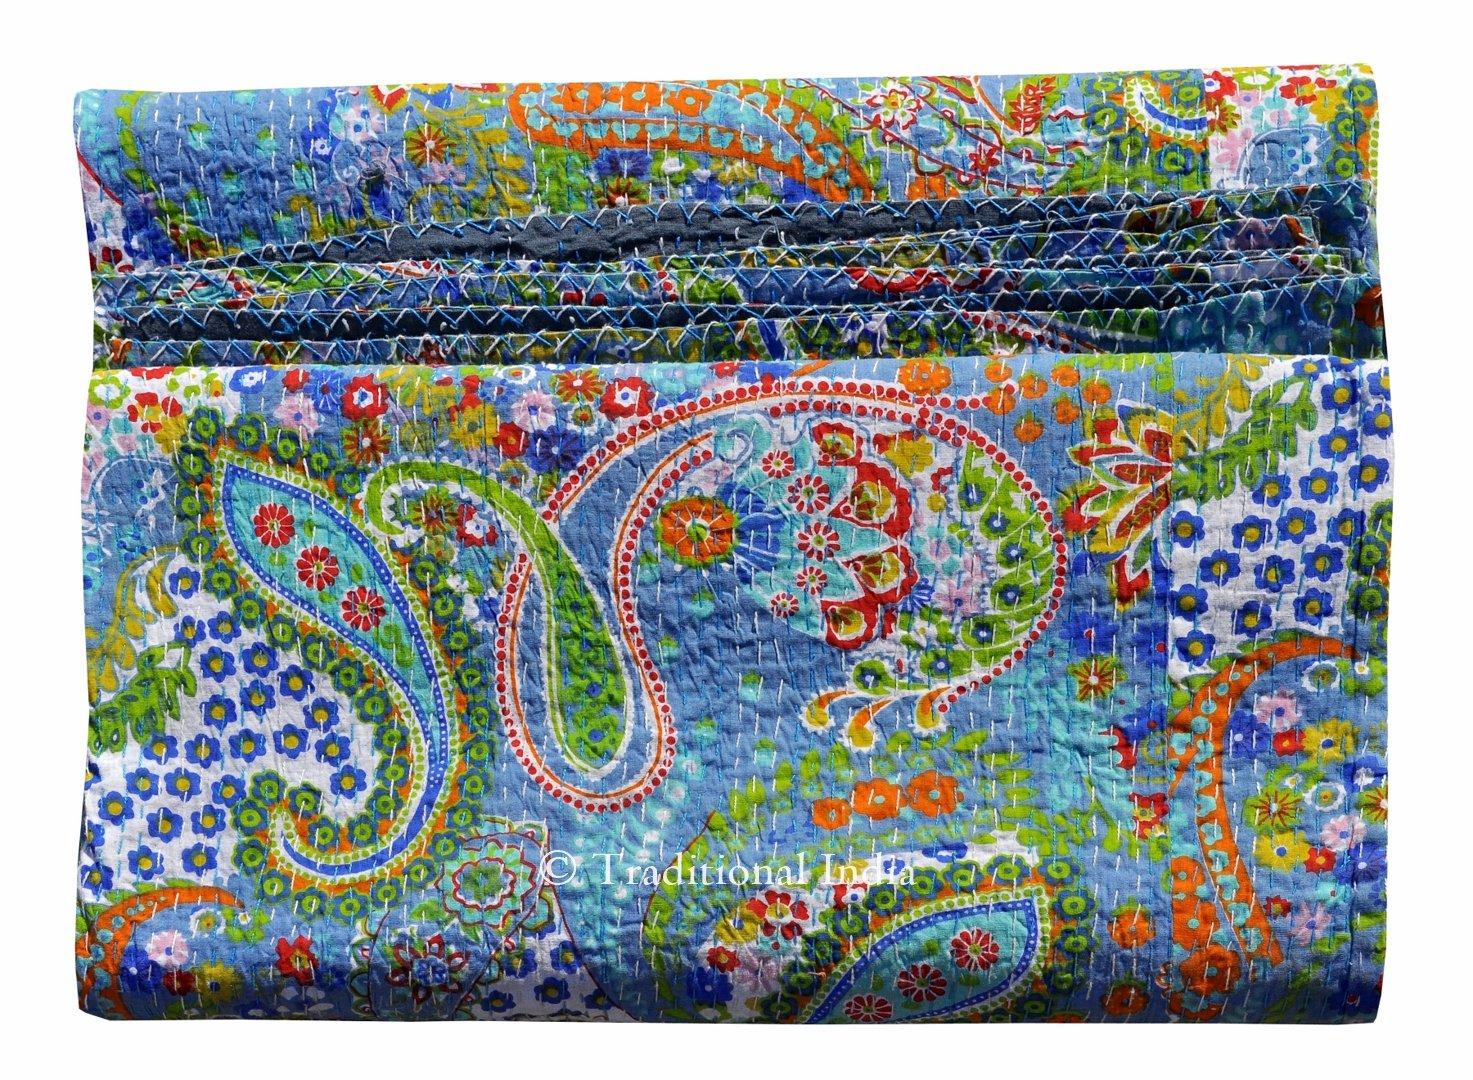 Handicrunch Bird Print King Size Kantha Quilt White, Kantha Blanket, Bed Cover, King Kantha Bedspread, Bohemian Bedding Kantha Size 90 Inch X 108 Inch By Handicrunch Home Decor